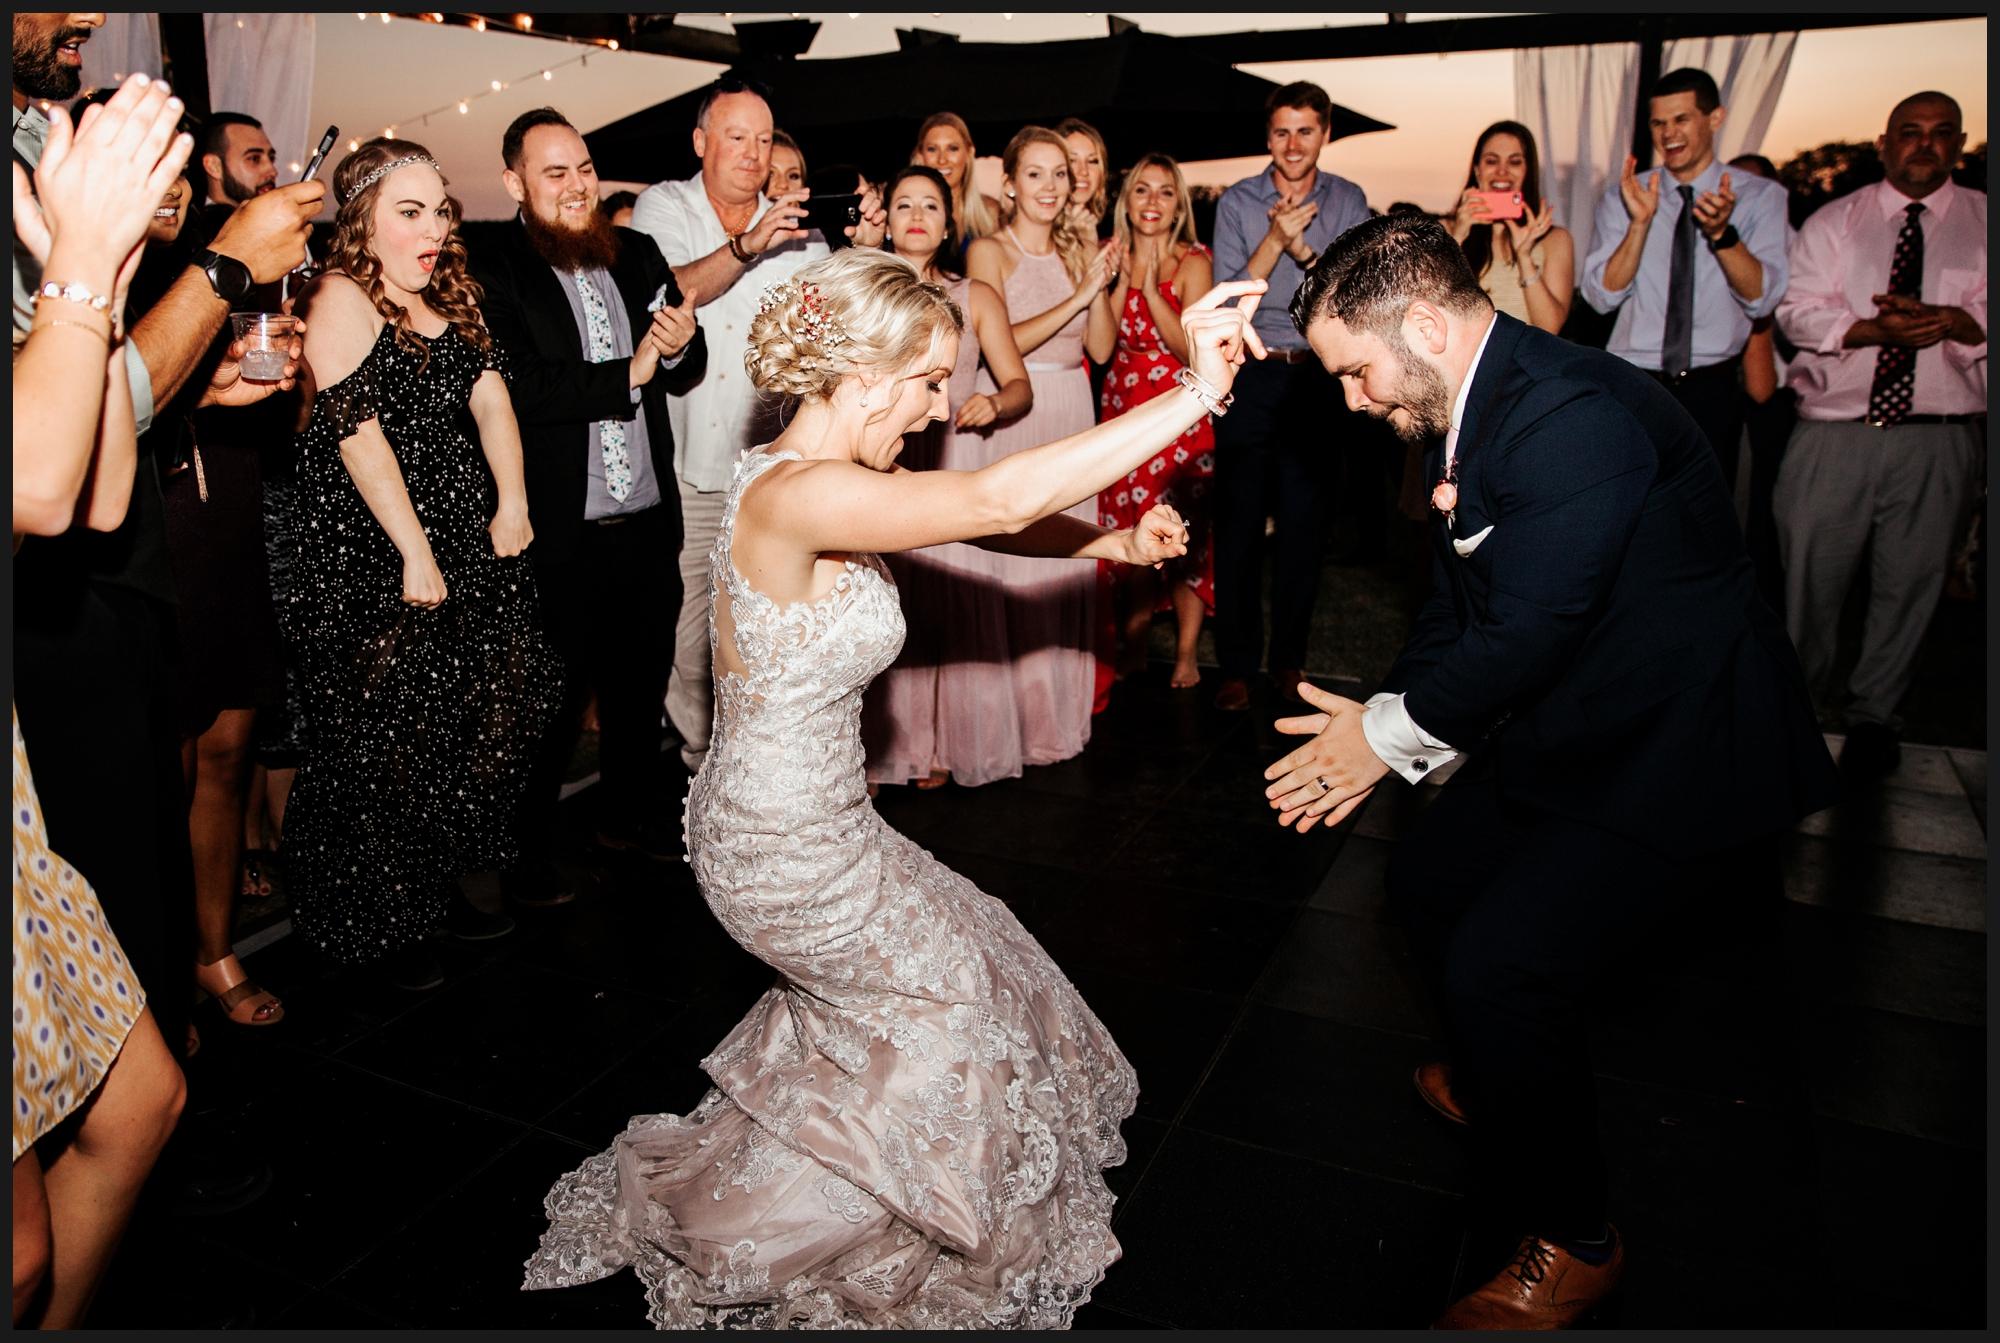 Orlando-Wedding-Photographer-destination-wedding-photographer-florida-wedding-photographer-hawaii-wedding-photographer_0622.jpg